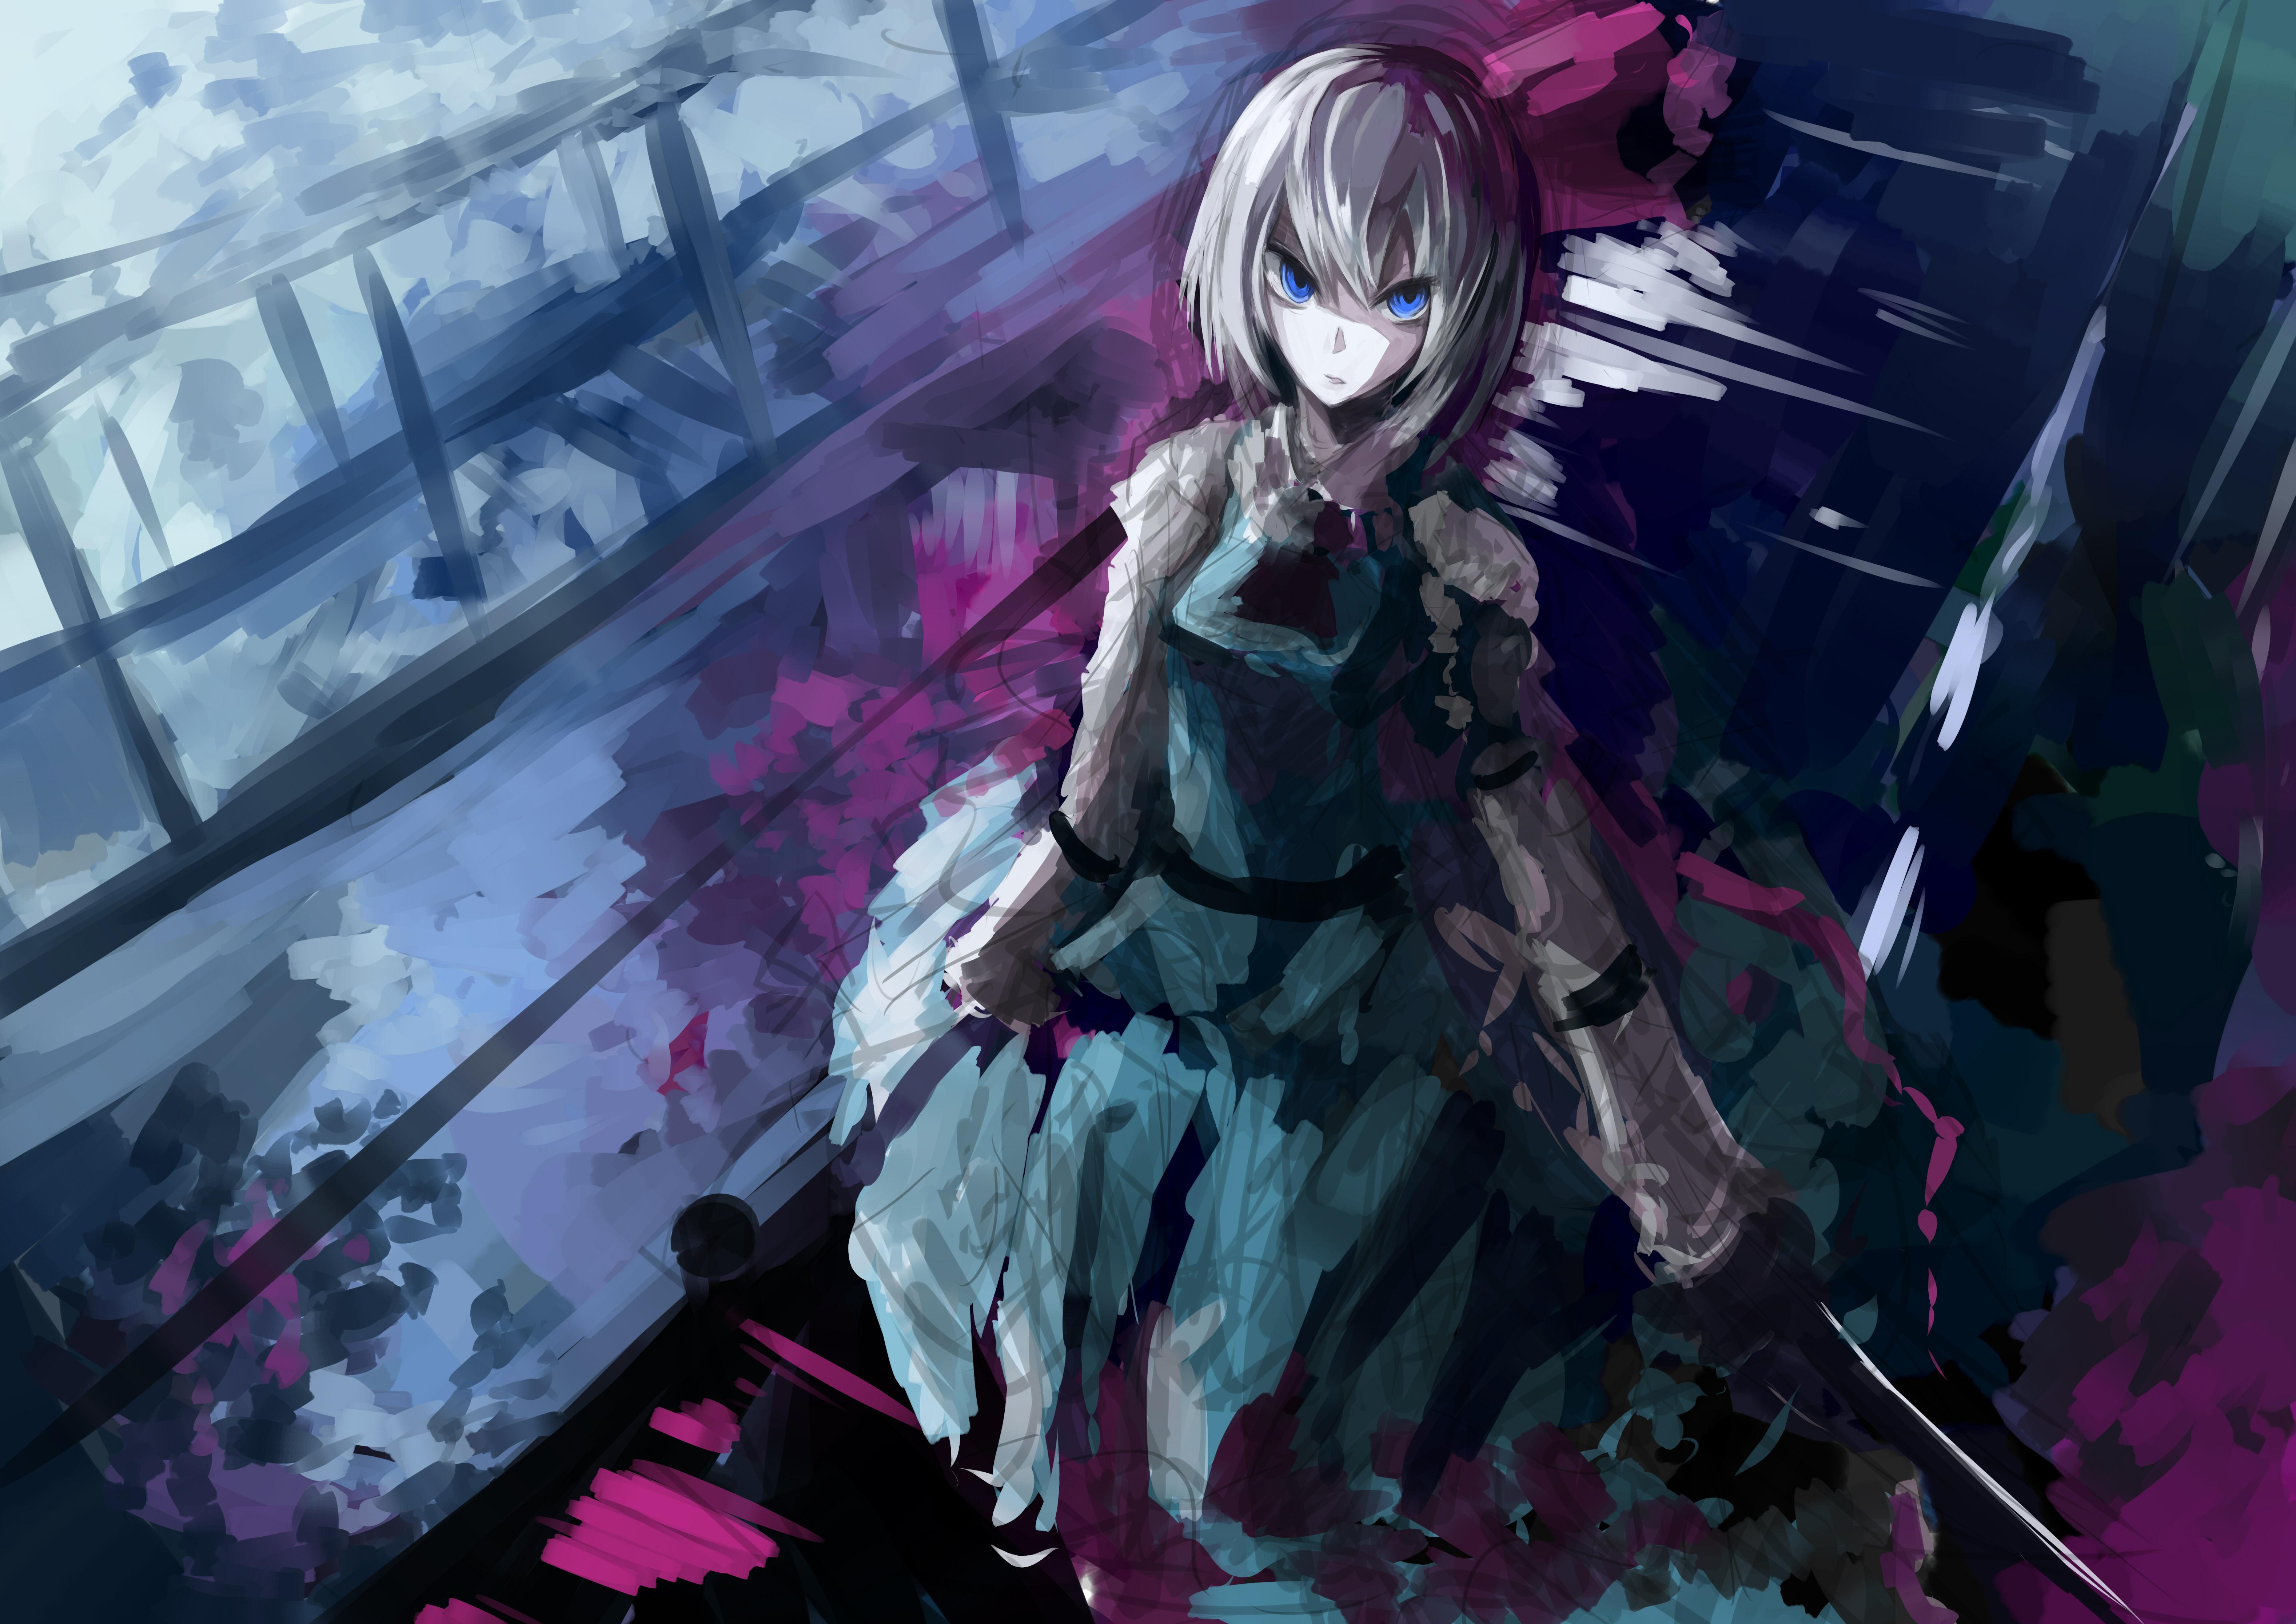 1360x768 anime girl white hair illustration laptop hd hd - Anime wallpaper 1360x768 hd ...